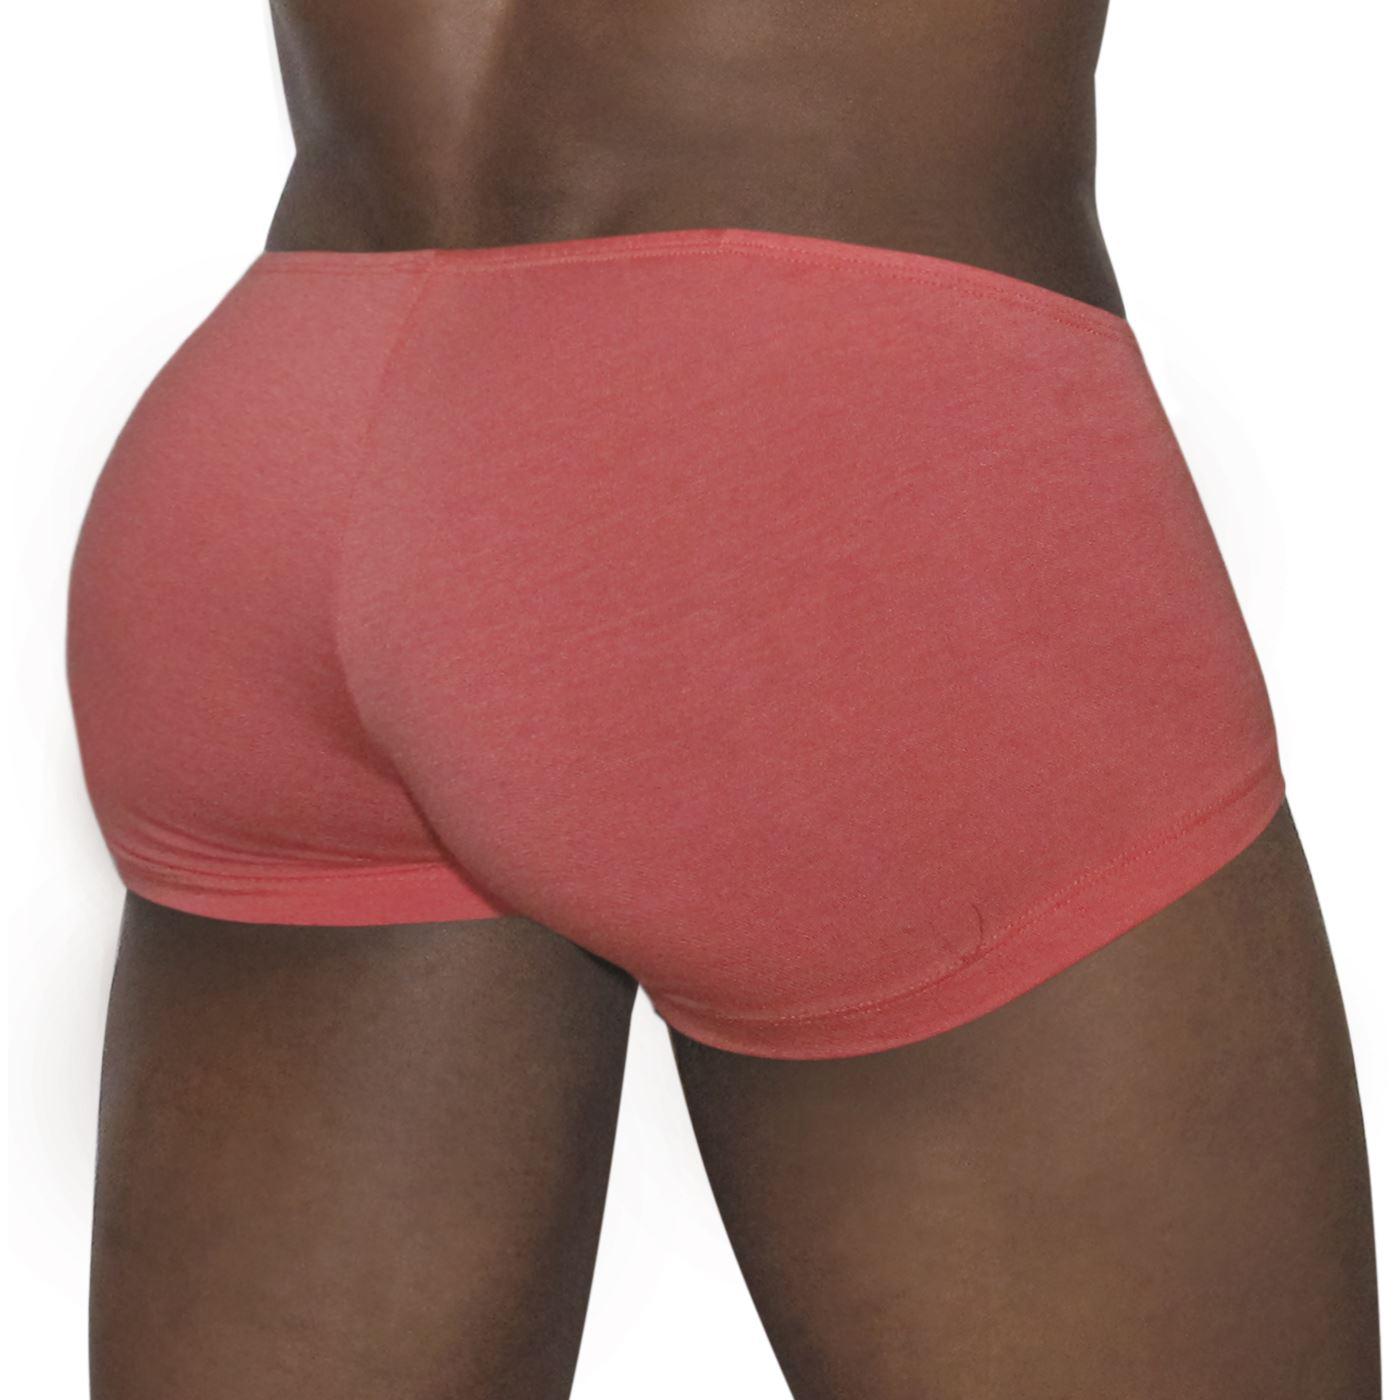 Ergowear-X3D-Modal-Mini-Boxer-men-039-s-underwear-enhance-short-low-rise-trunk-brief miniatuur 10